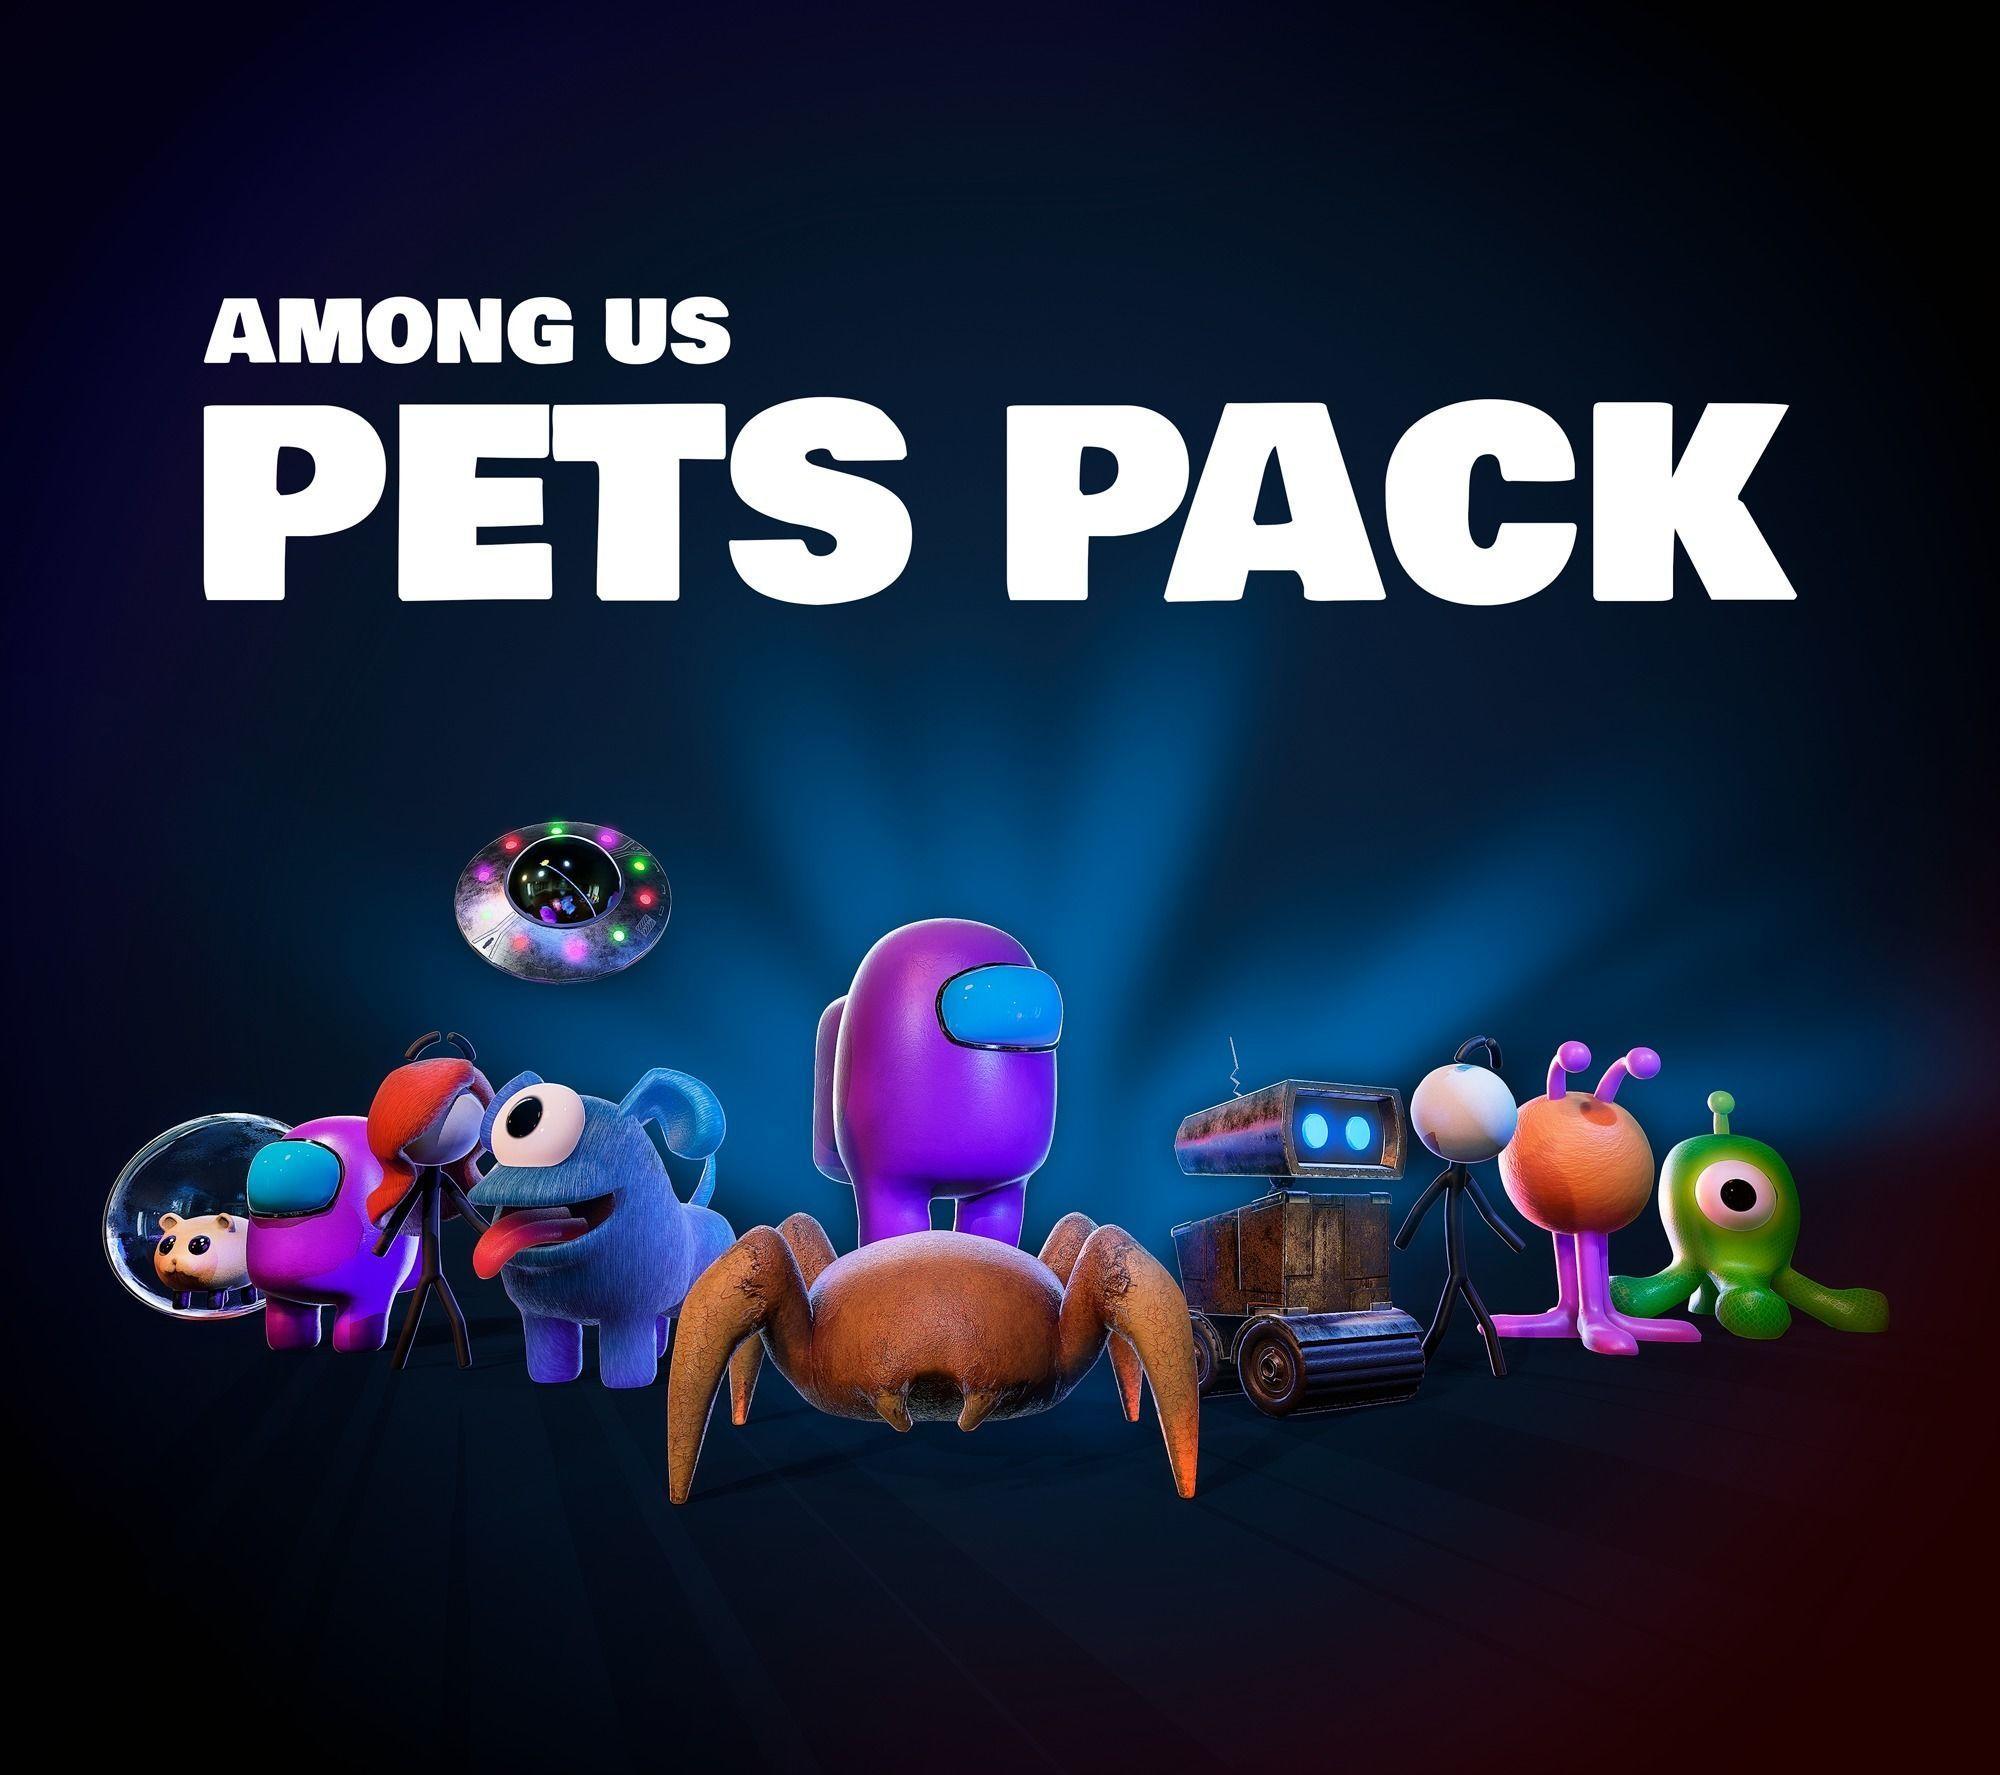 Among Us Pets Pack